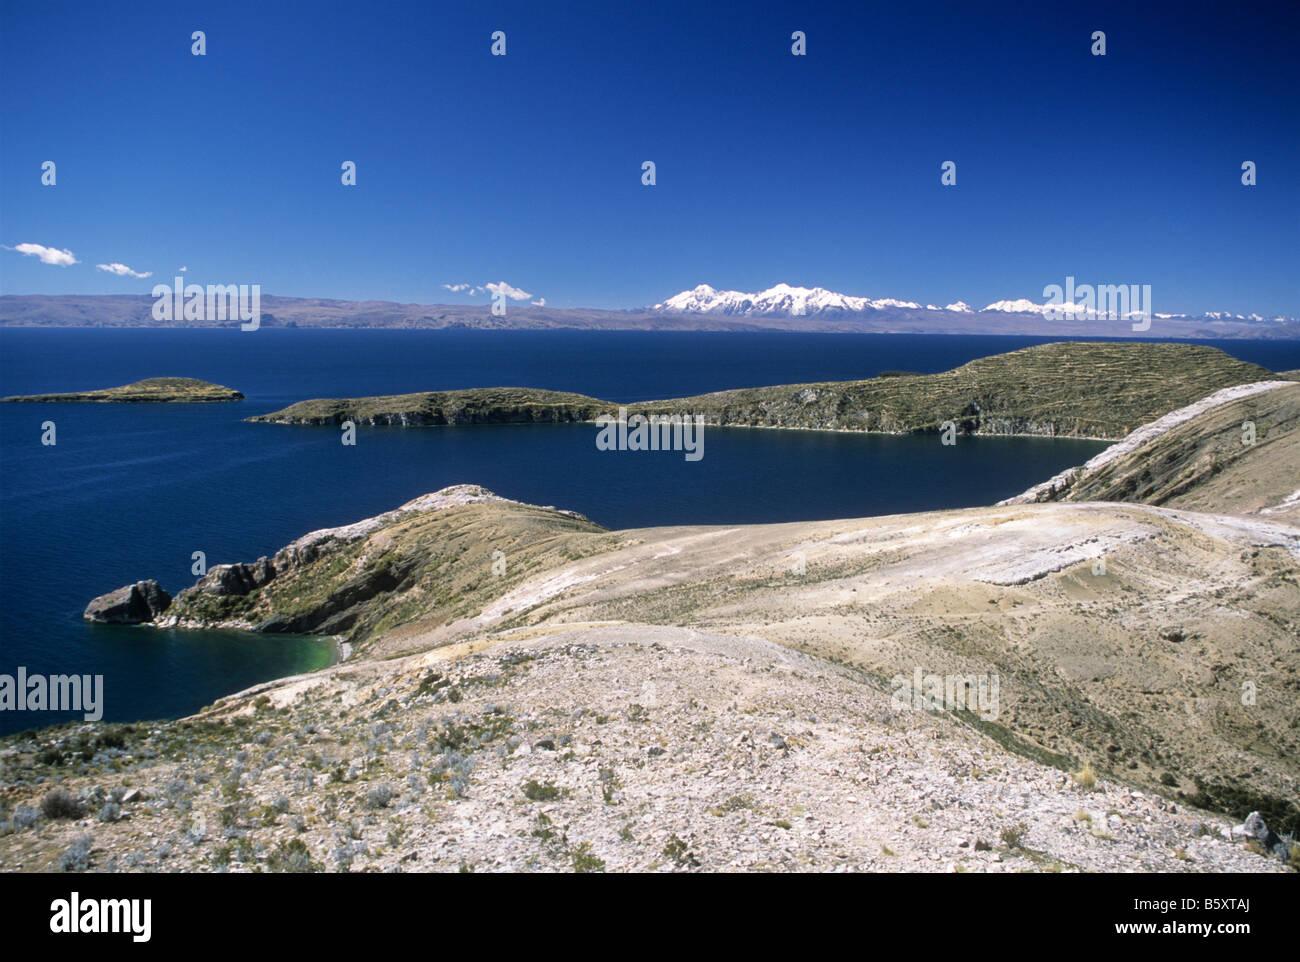 View of Cordillera Real range from Sun Island, Lake Titicaca, Bolivia - Stock Image